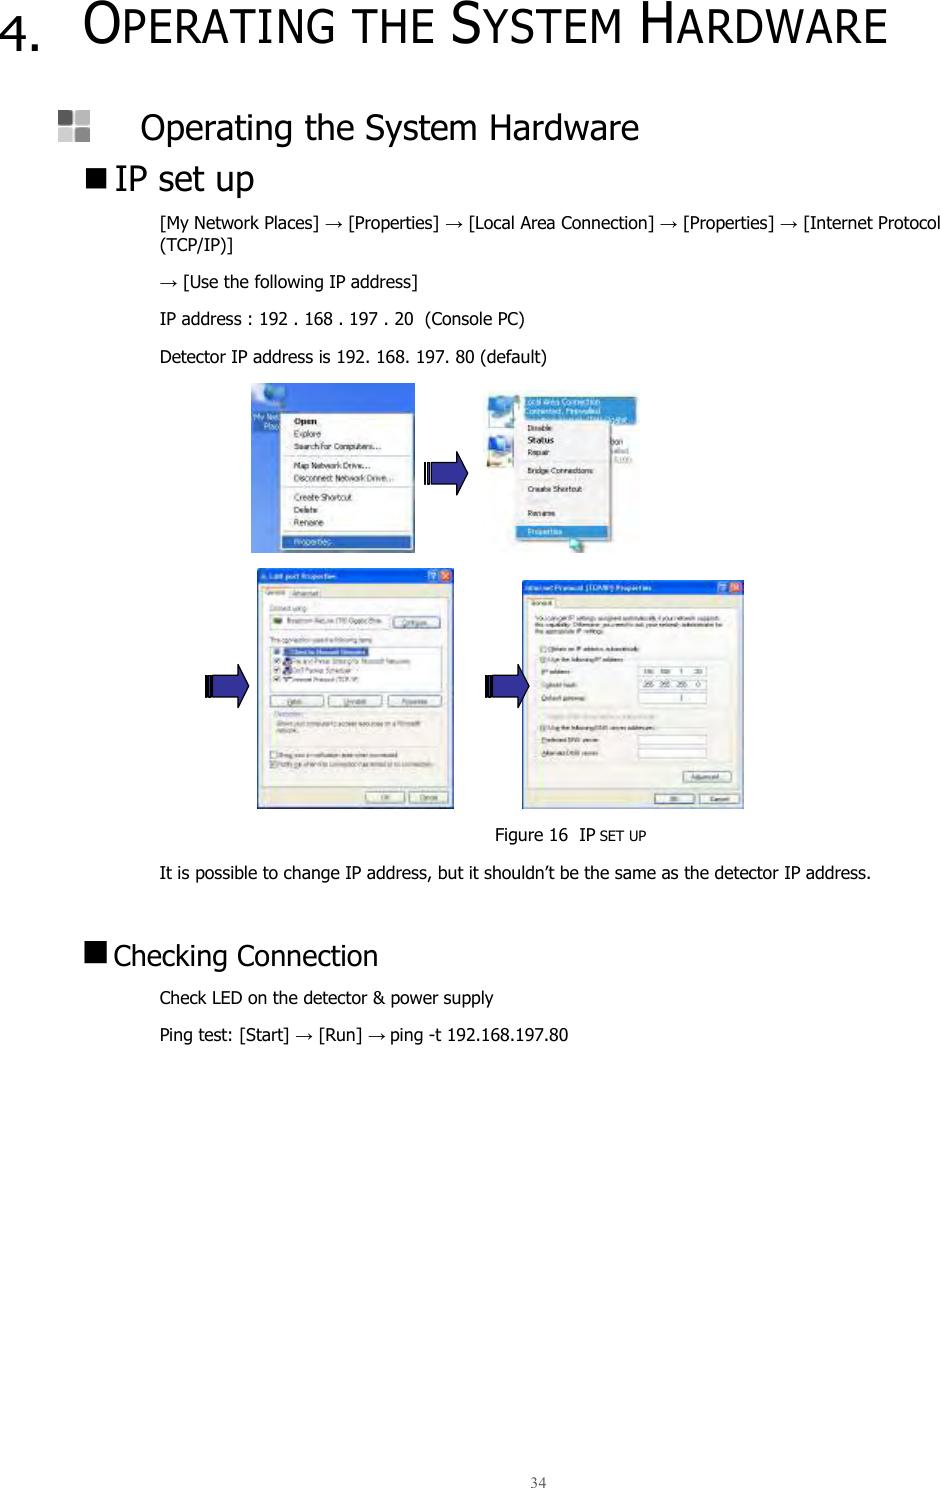 samsung electronics co widt30q wifi module user manual s3025 w user rh usermanual wiki Samsung Refrigerator Troubleshooting Guide Samsung TV Schematics